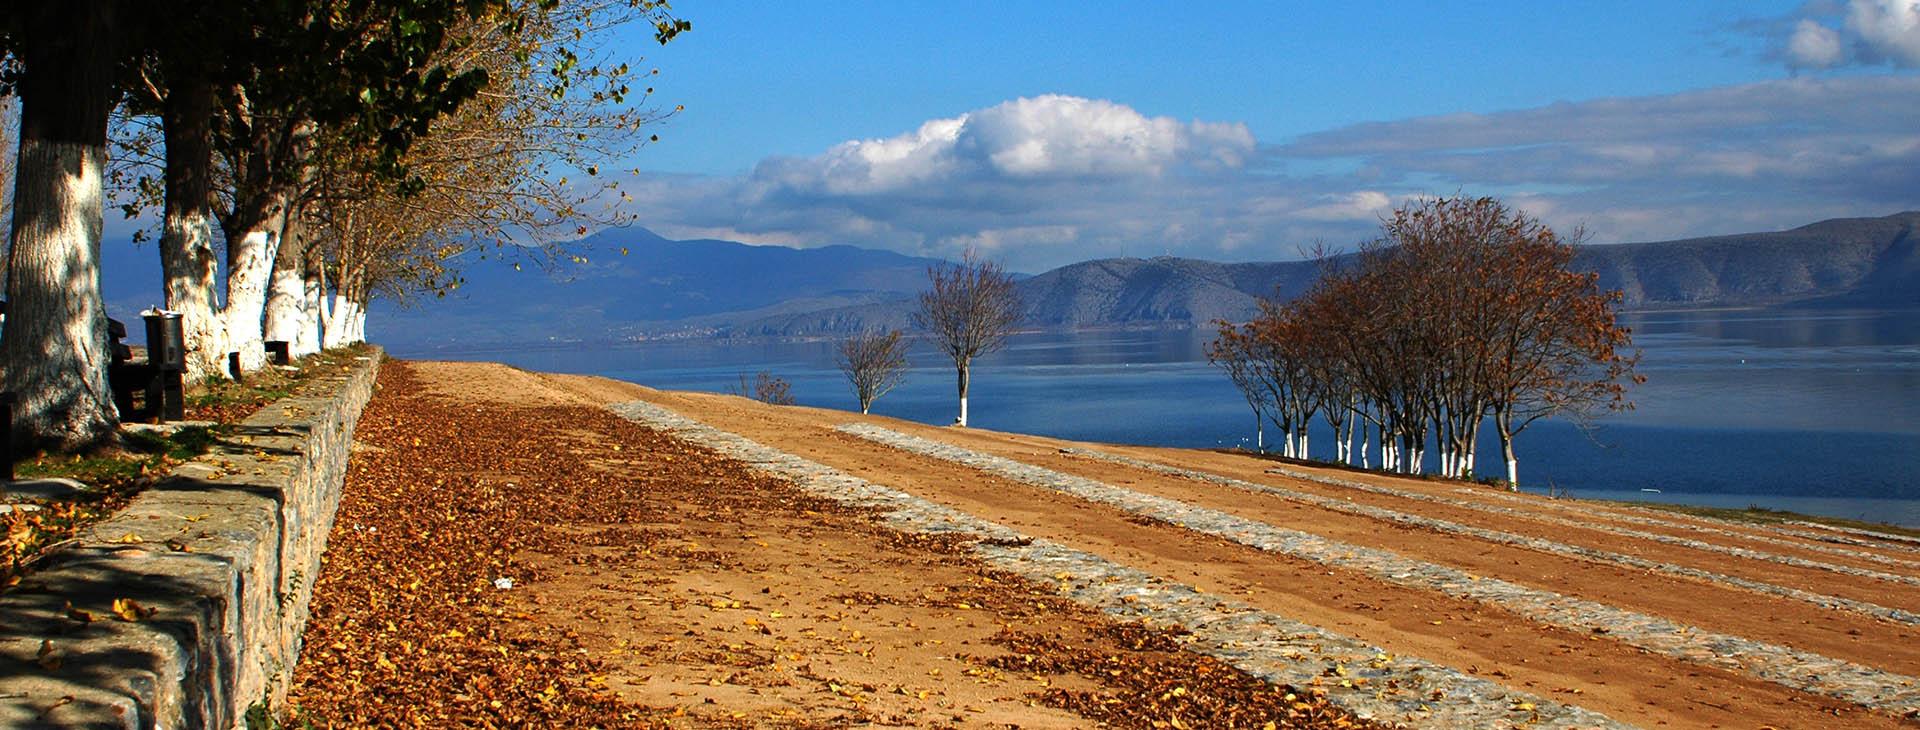 Vegoritida lake, Agios Panteleimon, Florina